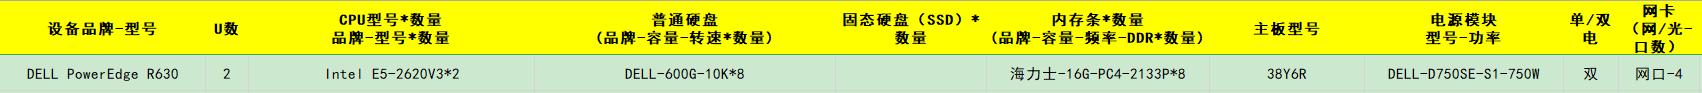 DELL PowerEdge R630 Intel E5-2620V3*2 DELL-600G-10K*8 海力士-16G-PC4-2133P*8